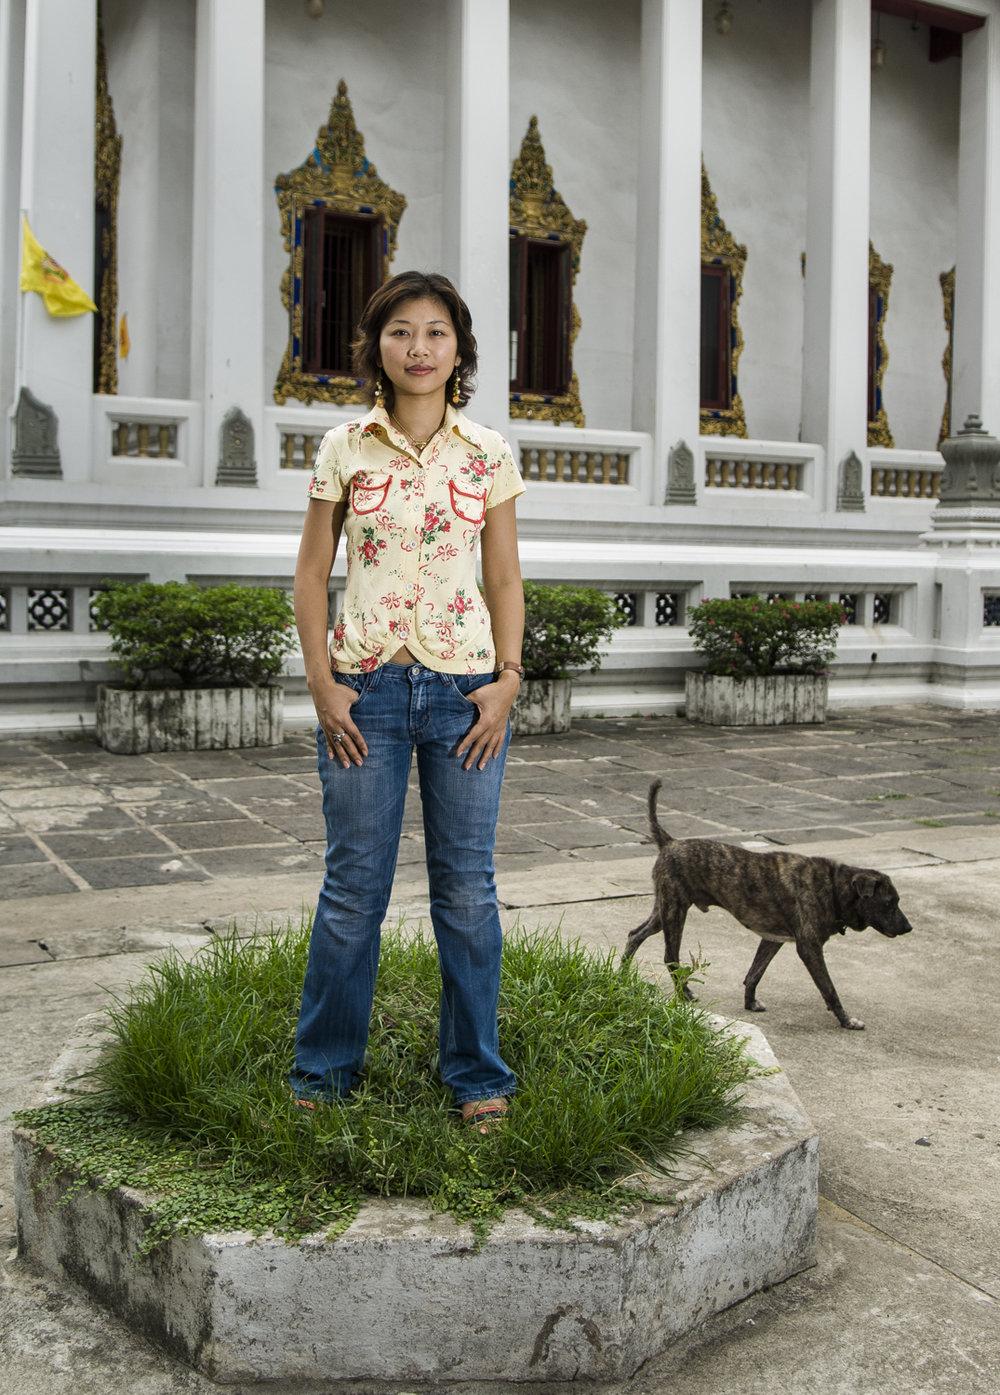 Penn State University Bangkok